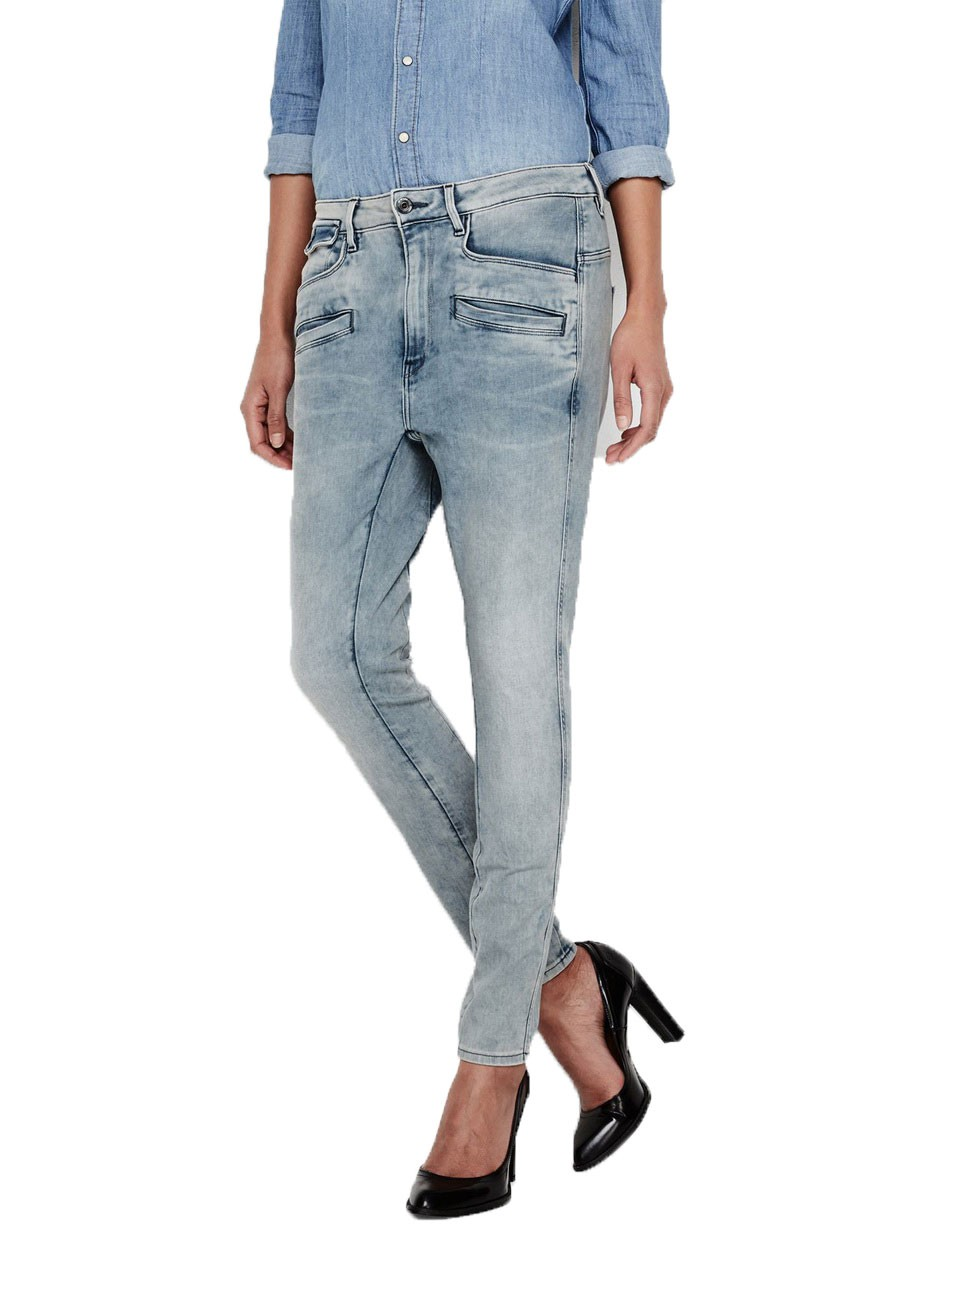 g star damen jeans dadin 3d low boyfriend blau light aged. Black Bedroom Furniture Sets. Home Design Ideas